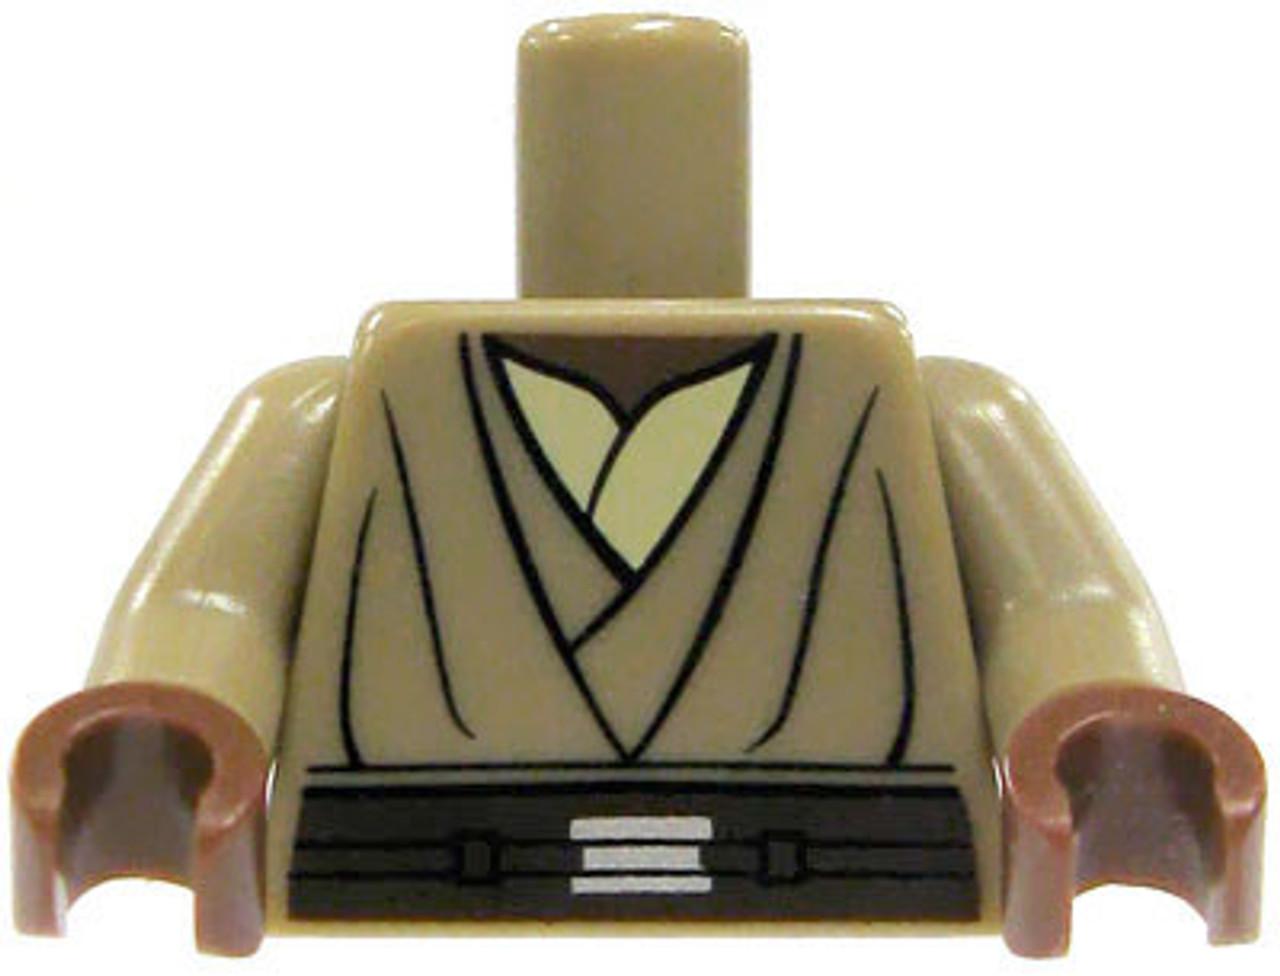 LEGO Indiana Jones Dark Tan Tunic Loose Torso [Loose]